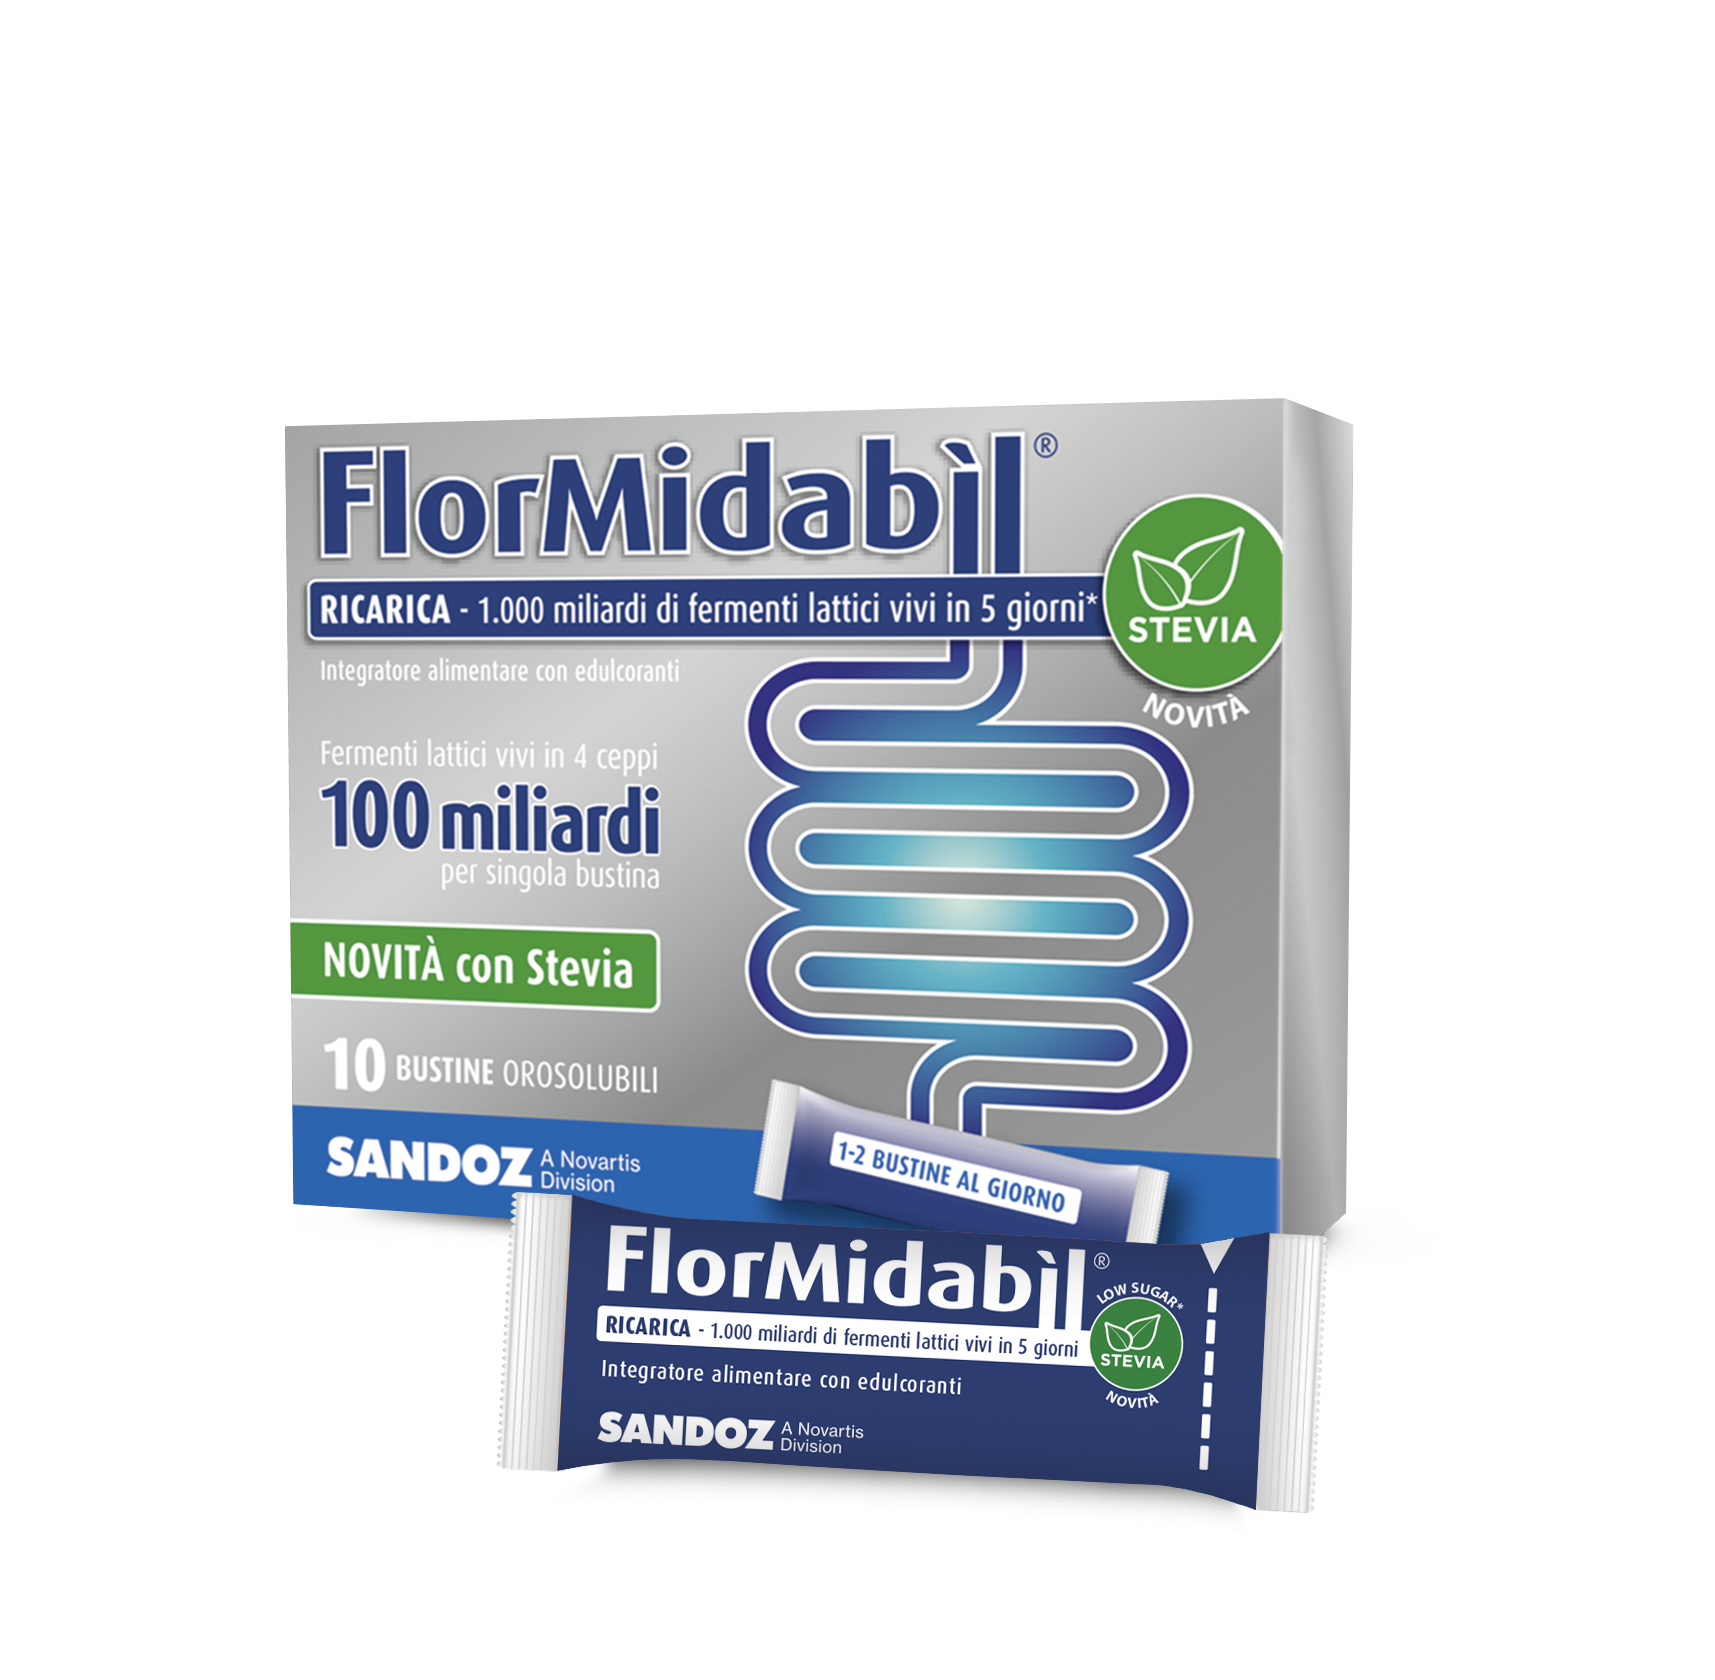 FlorMidabìl RICARICA